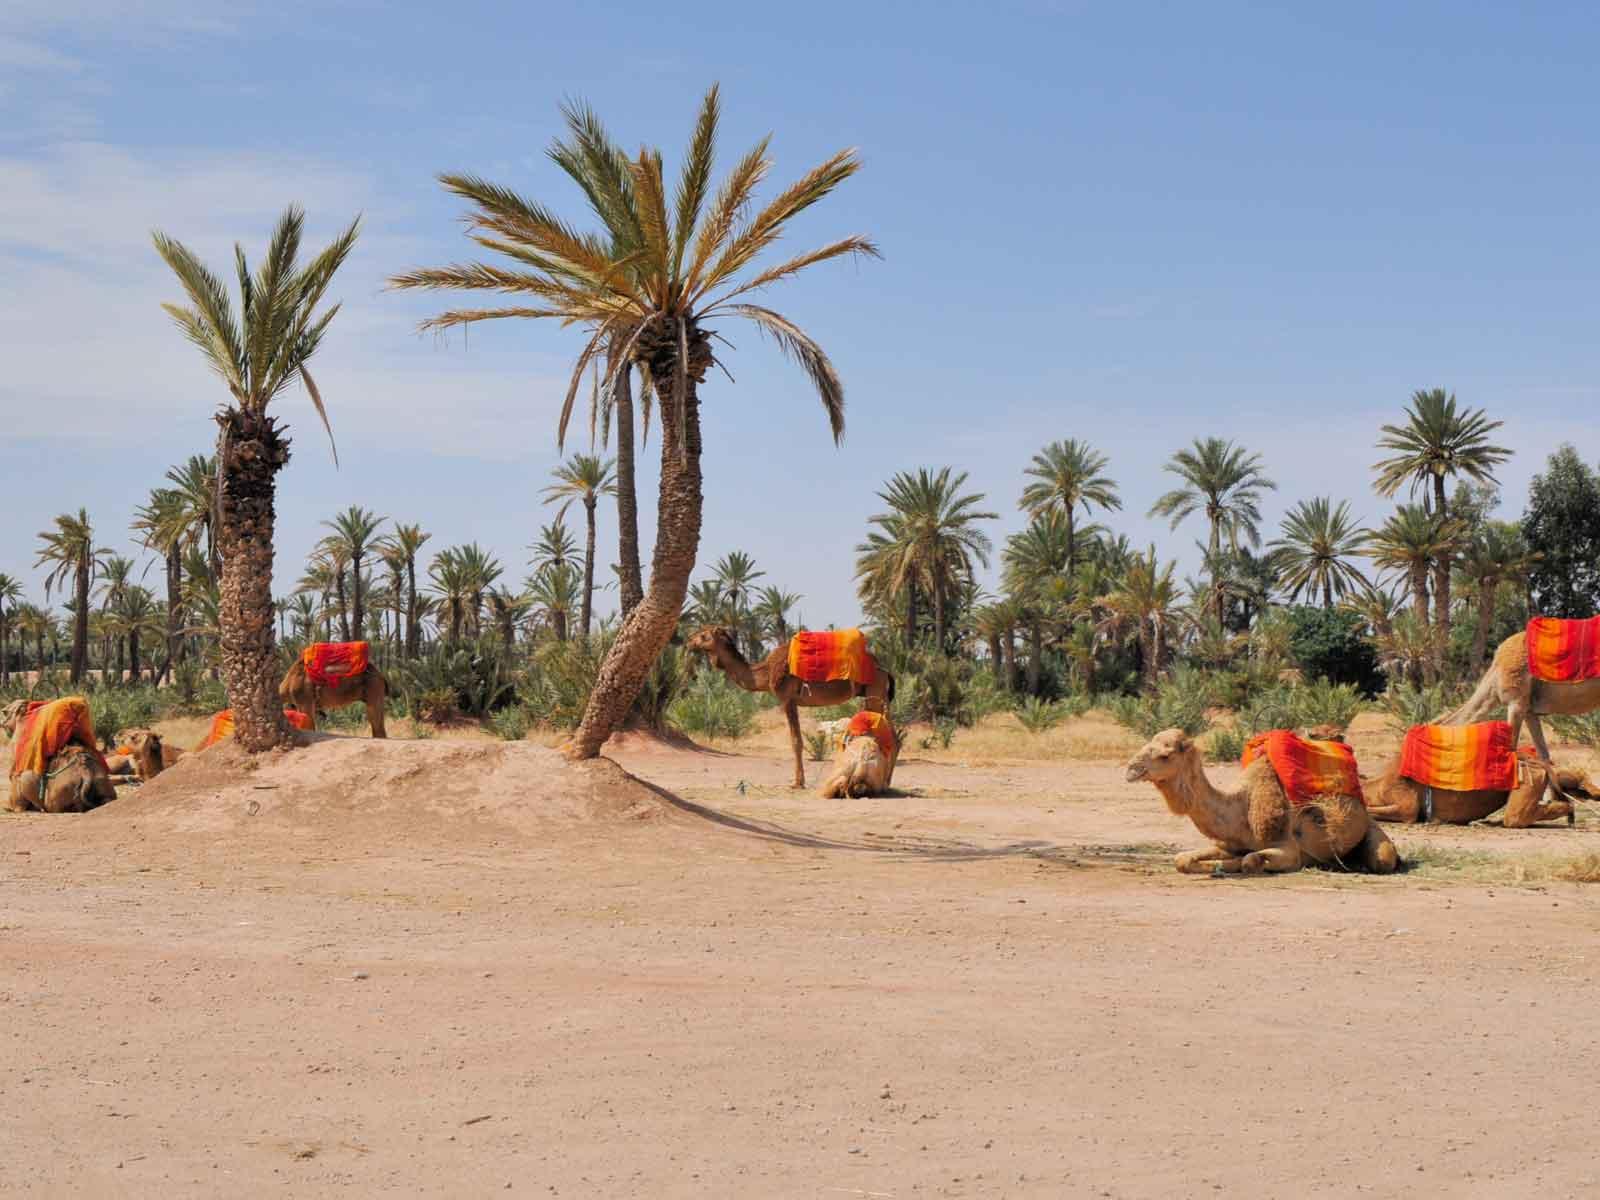 Excursion day trip Marrakech to palmerai camel treks